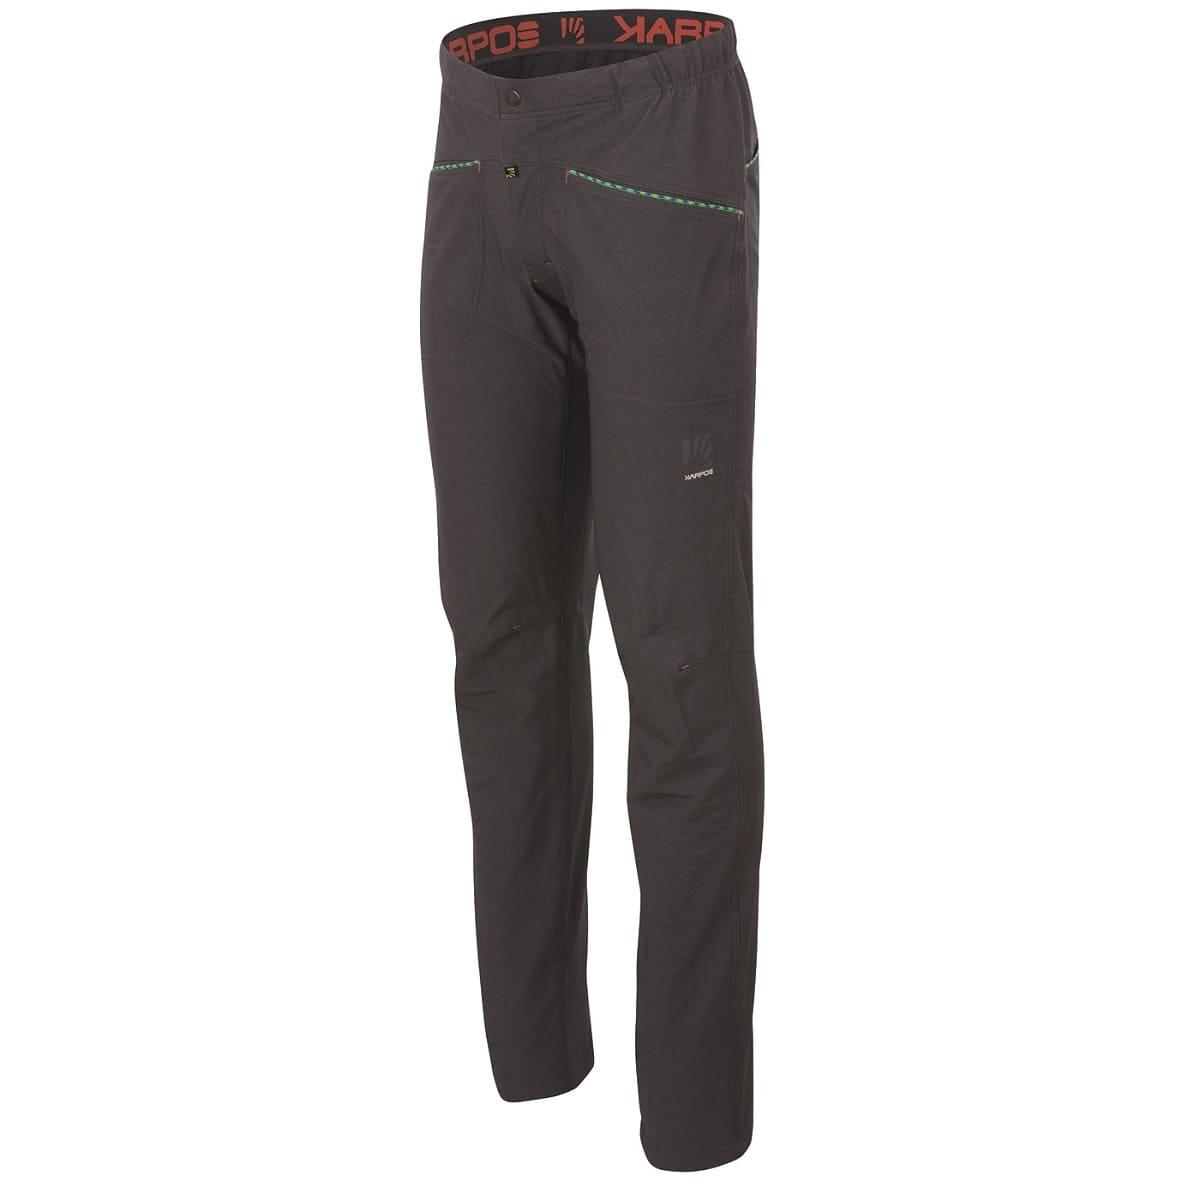 Karpos Fiames Pant Grey - 46